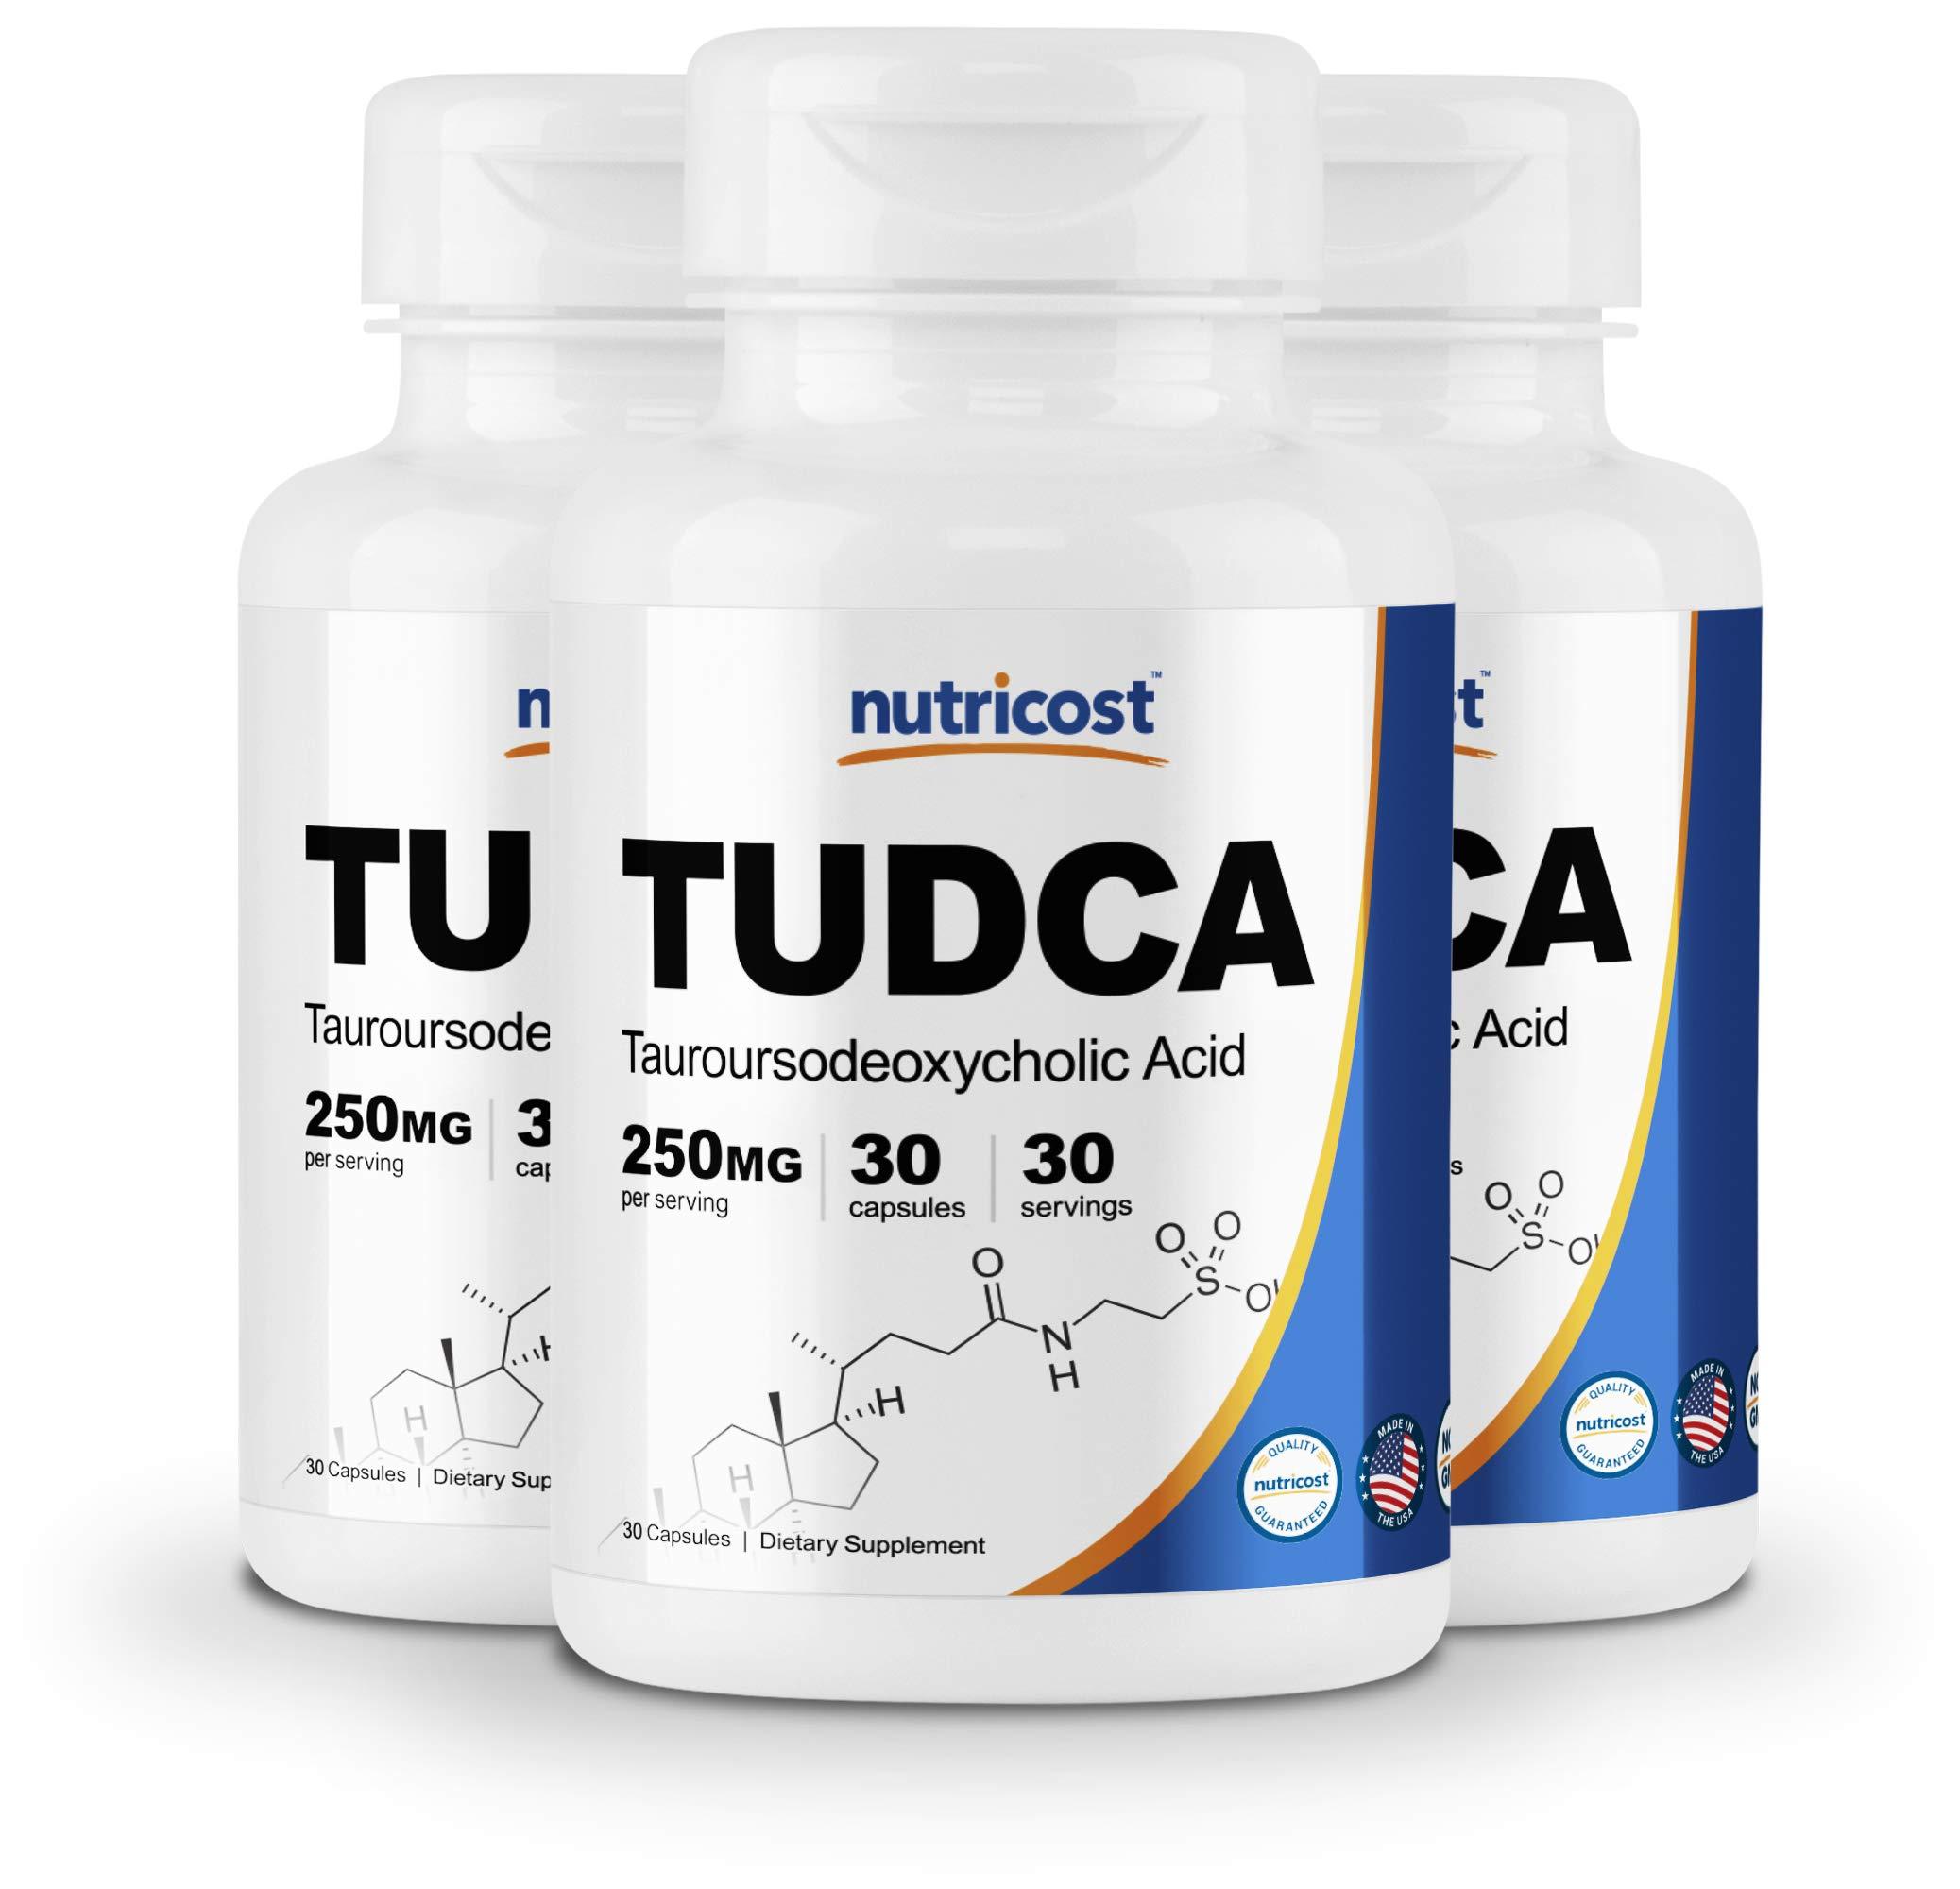 Nutricost Tudca 250mg, 30 Capsules (3 Bottles)